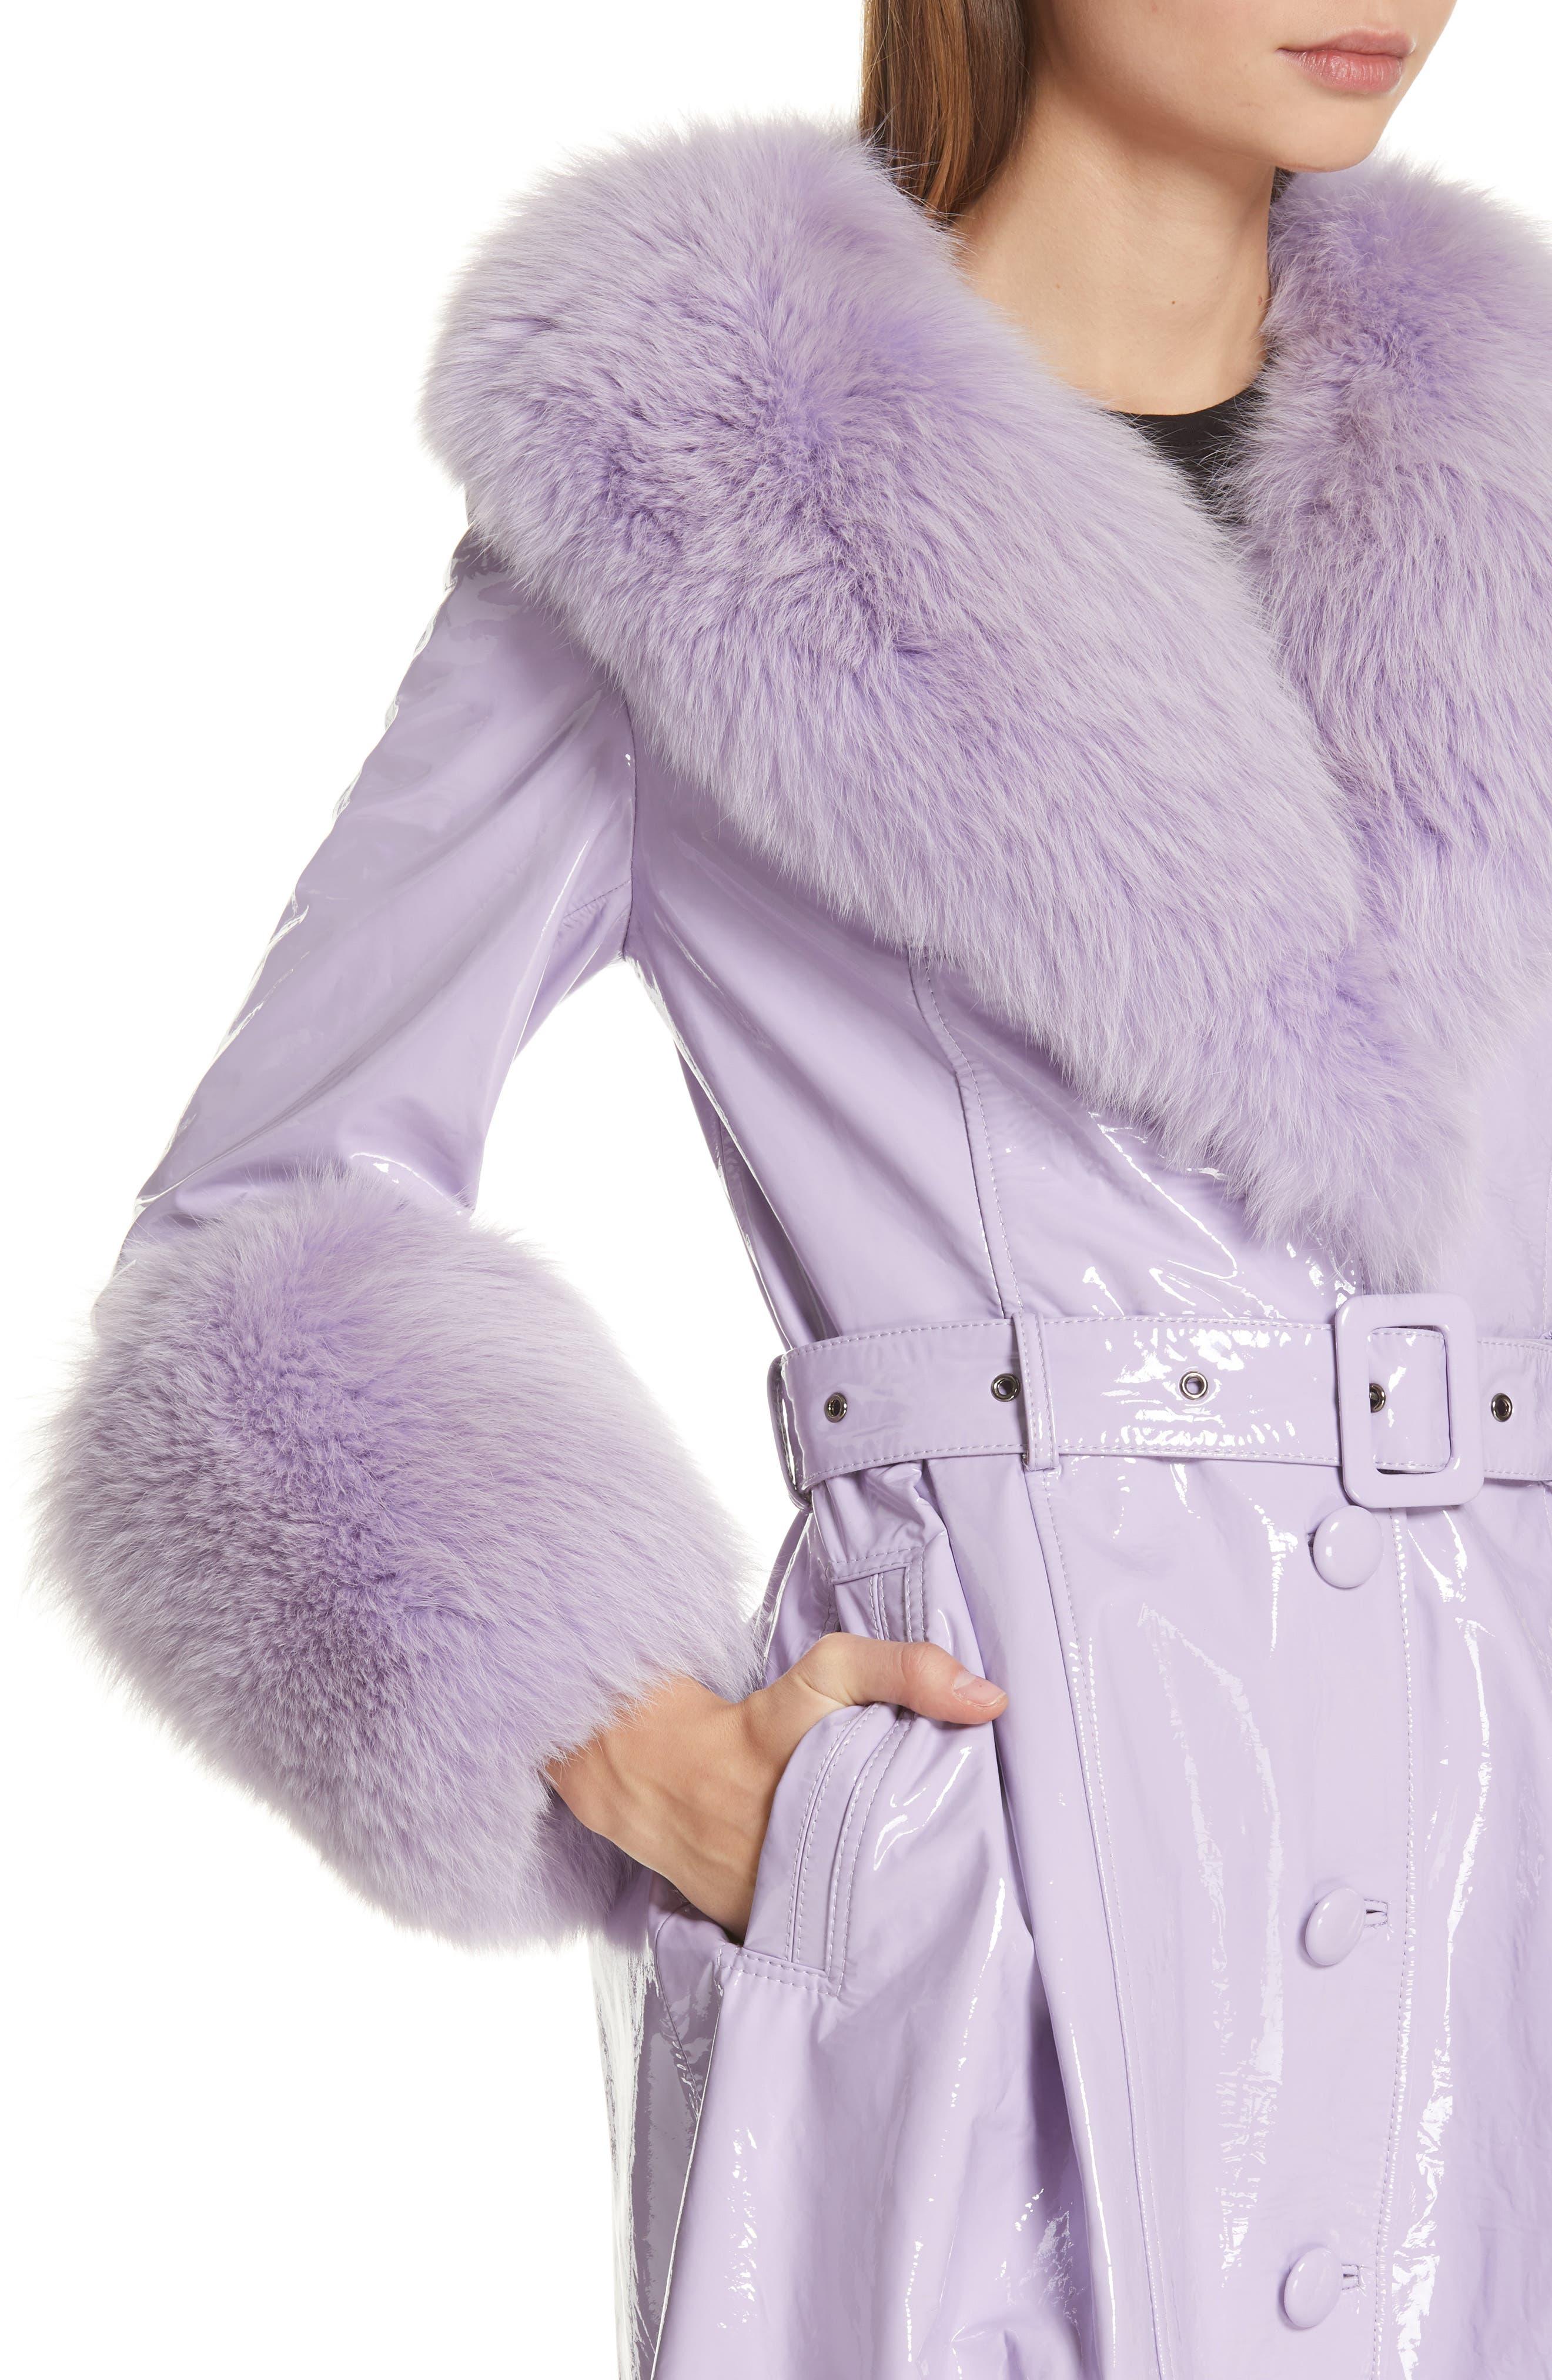 Patent Leather Coat with Genuine Fox Fur Trim,                             Alternate thumbnail 4, color,                             LAVENDER